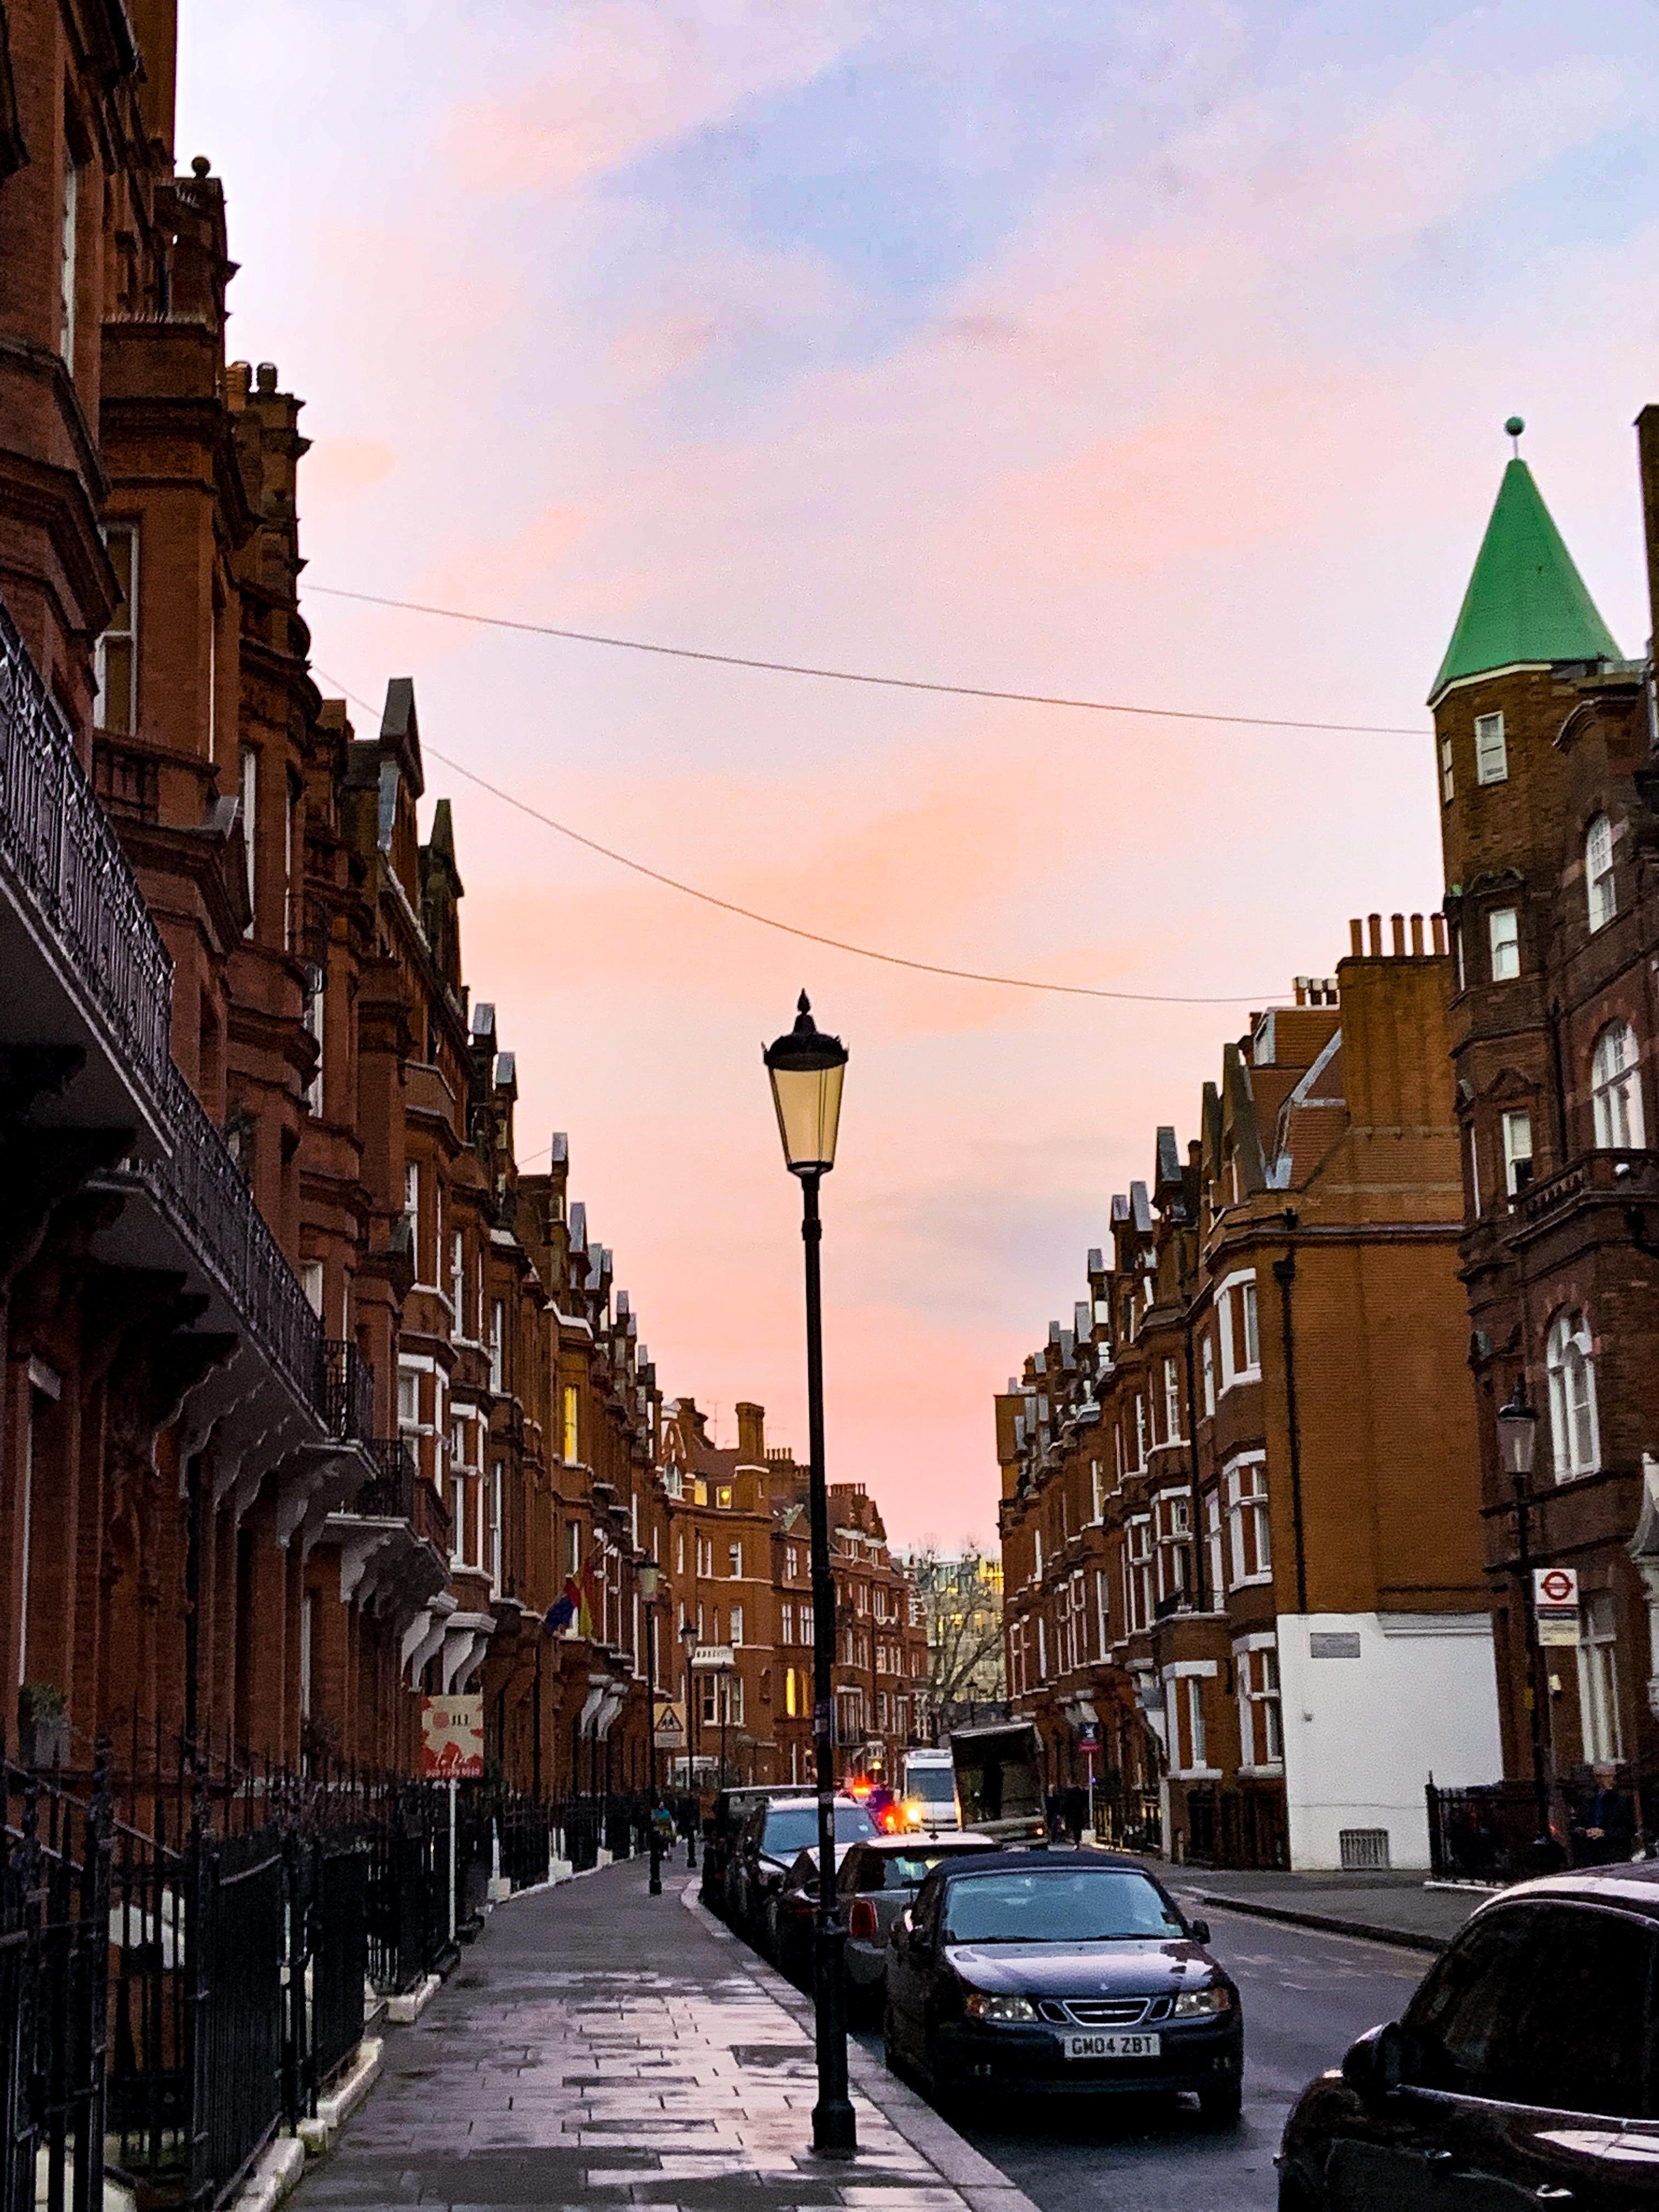 London - January 2019